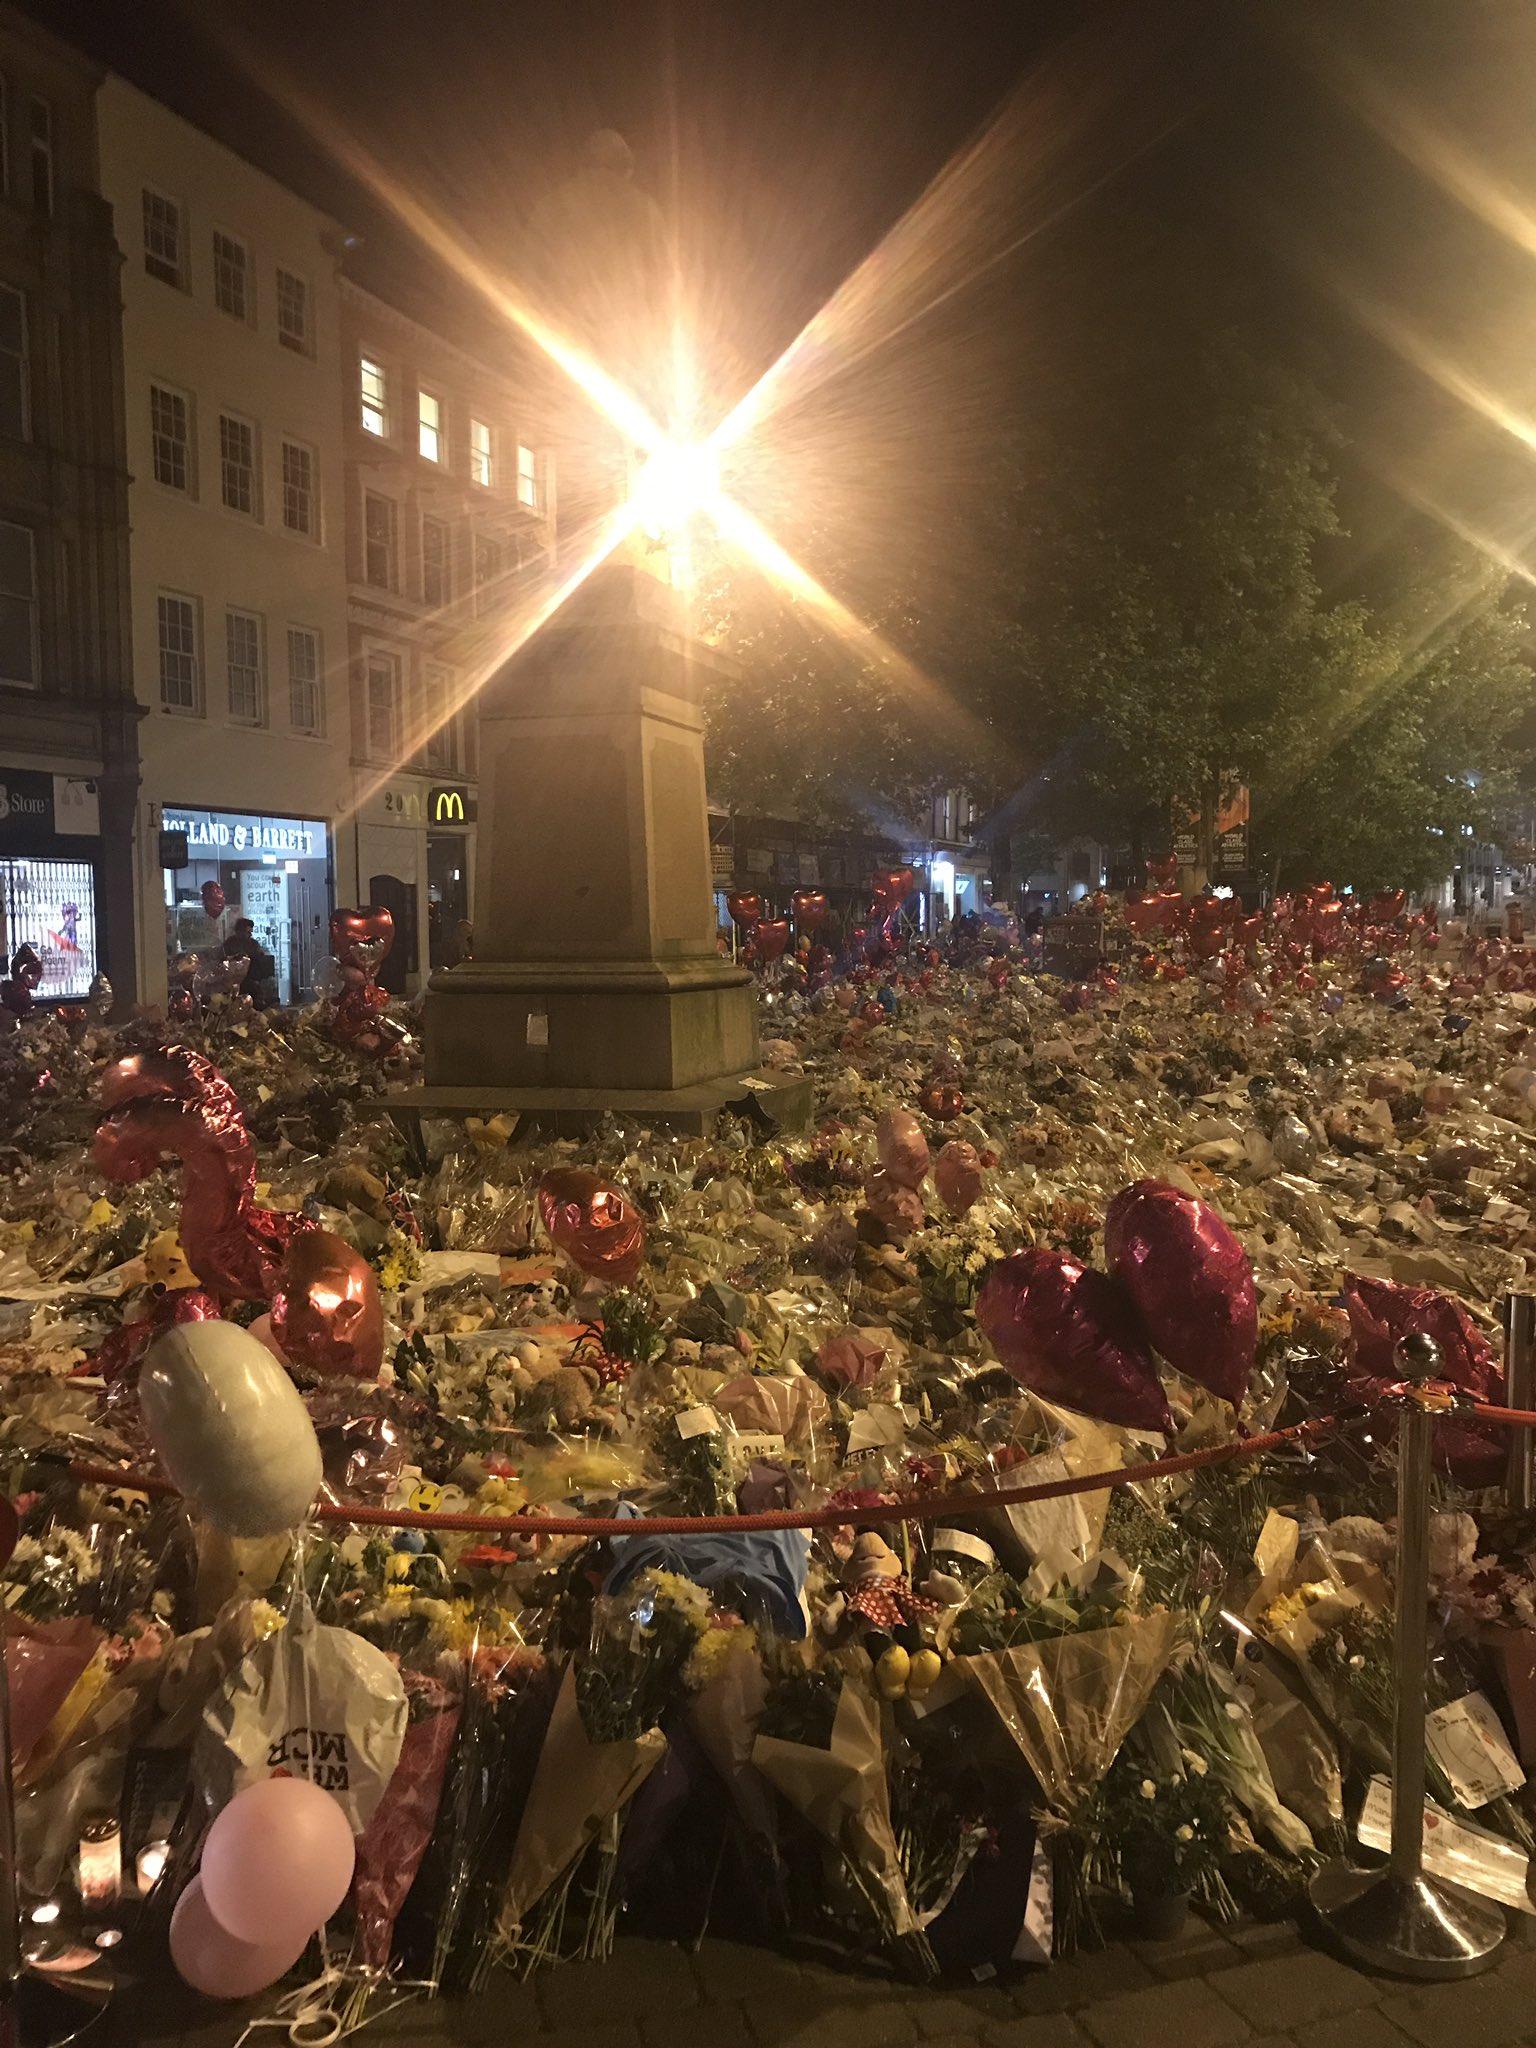 The power of Manchester. One love https://t.co/hfHDJiFgI6